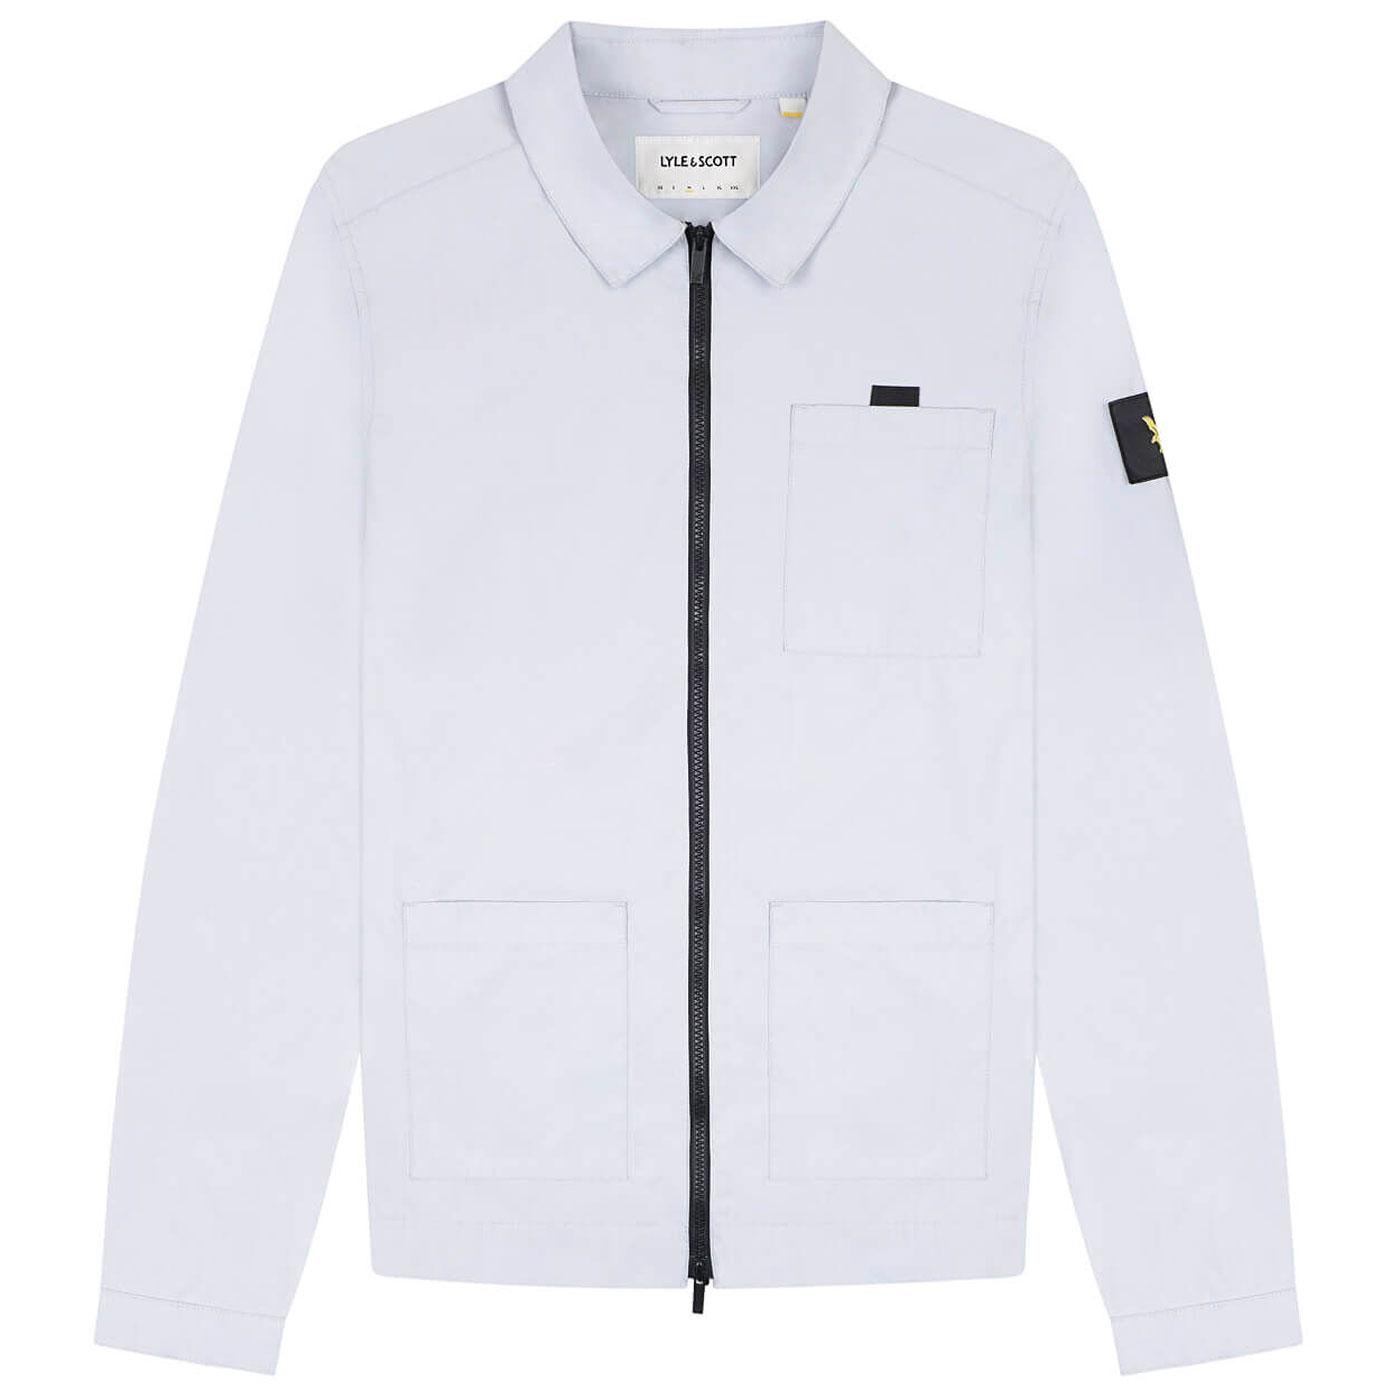 LYLE & Scott Mod Casuals Ripstop Nylon Overshirt